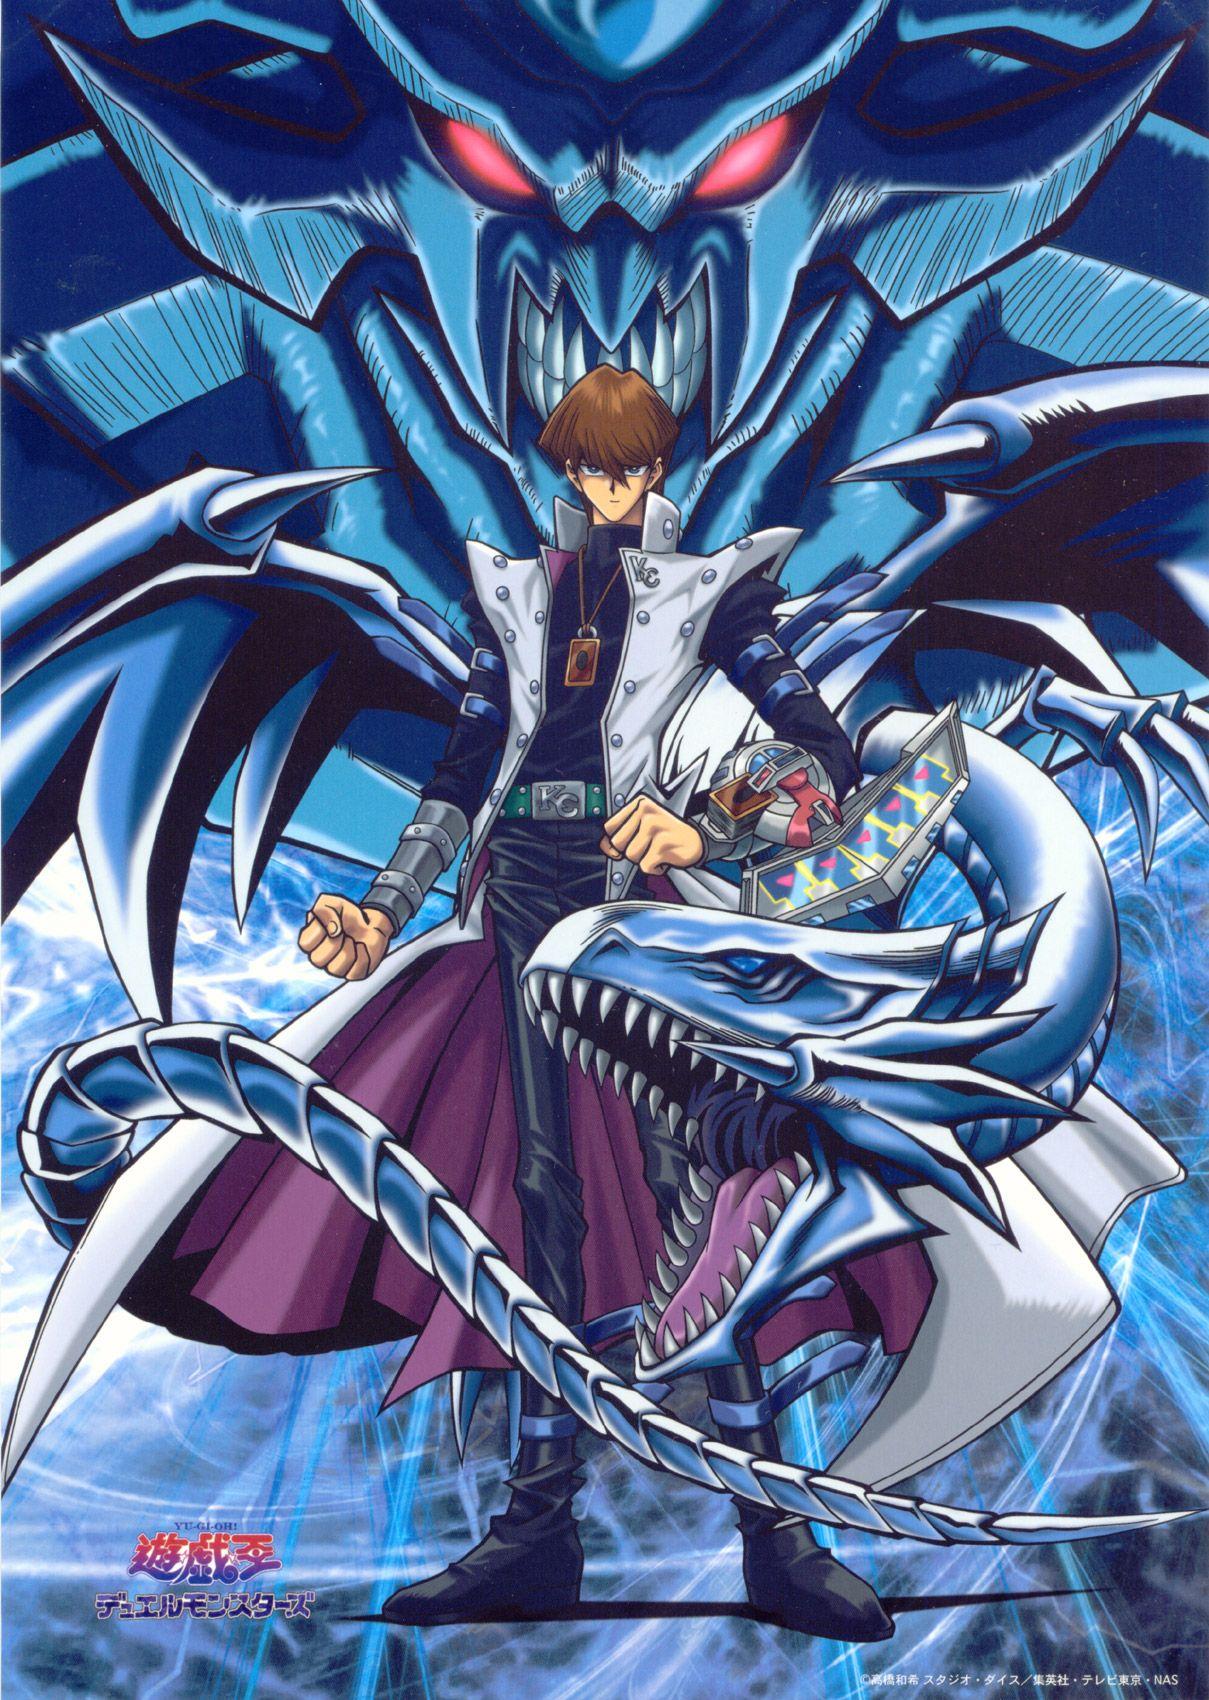 seto kaiba the mages pinterest anime manga and sword art online